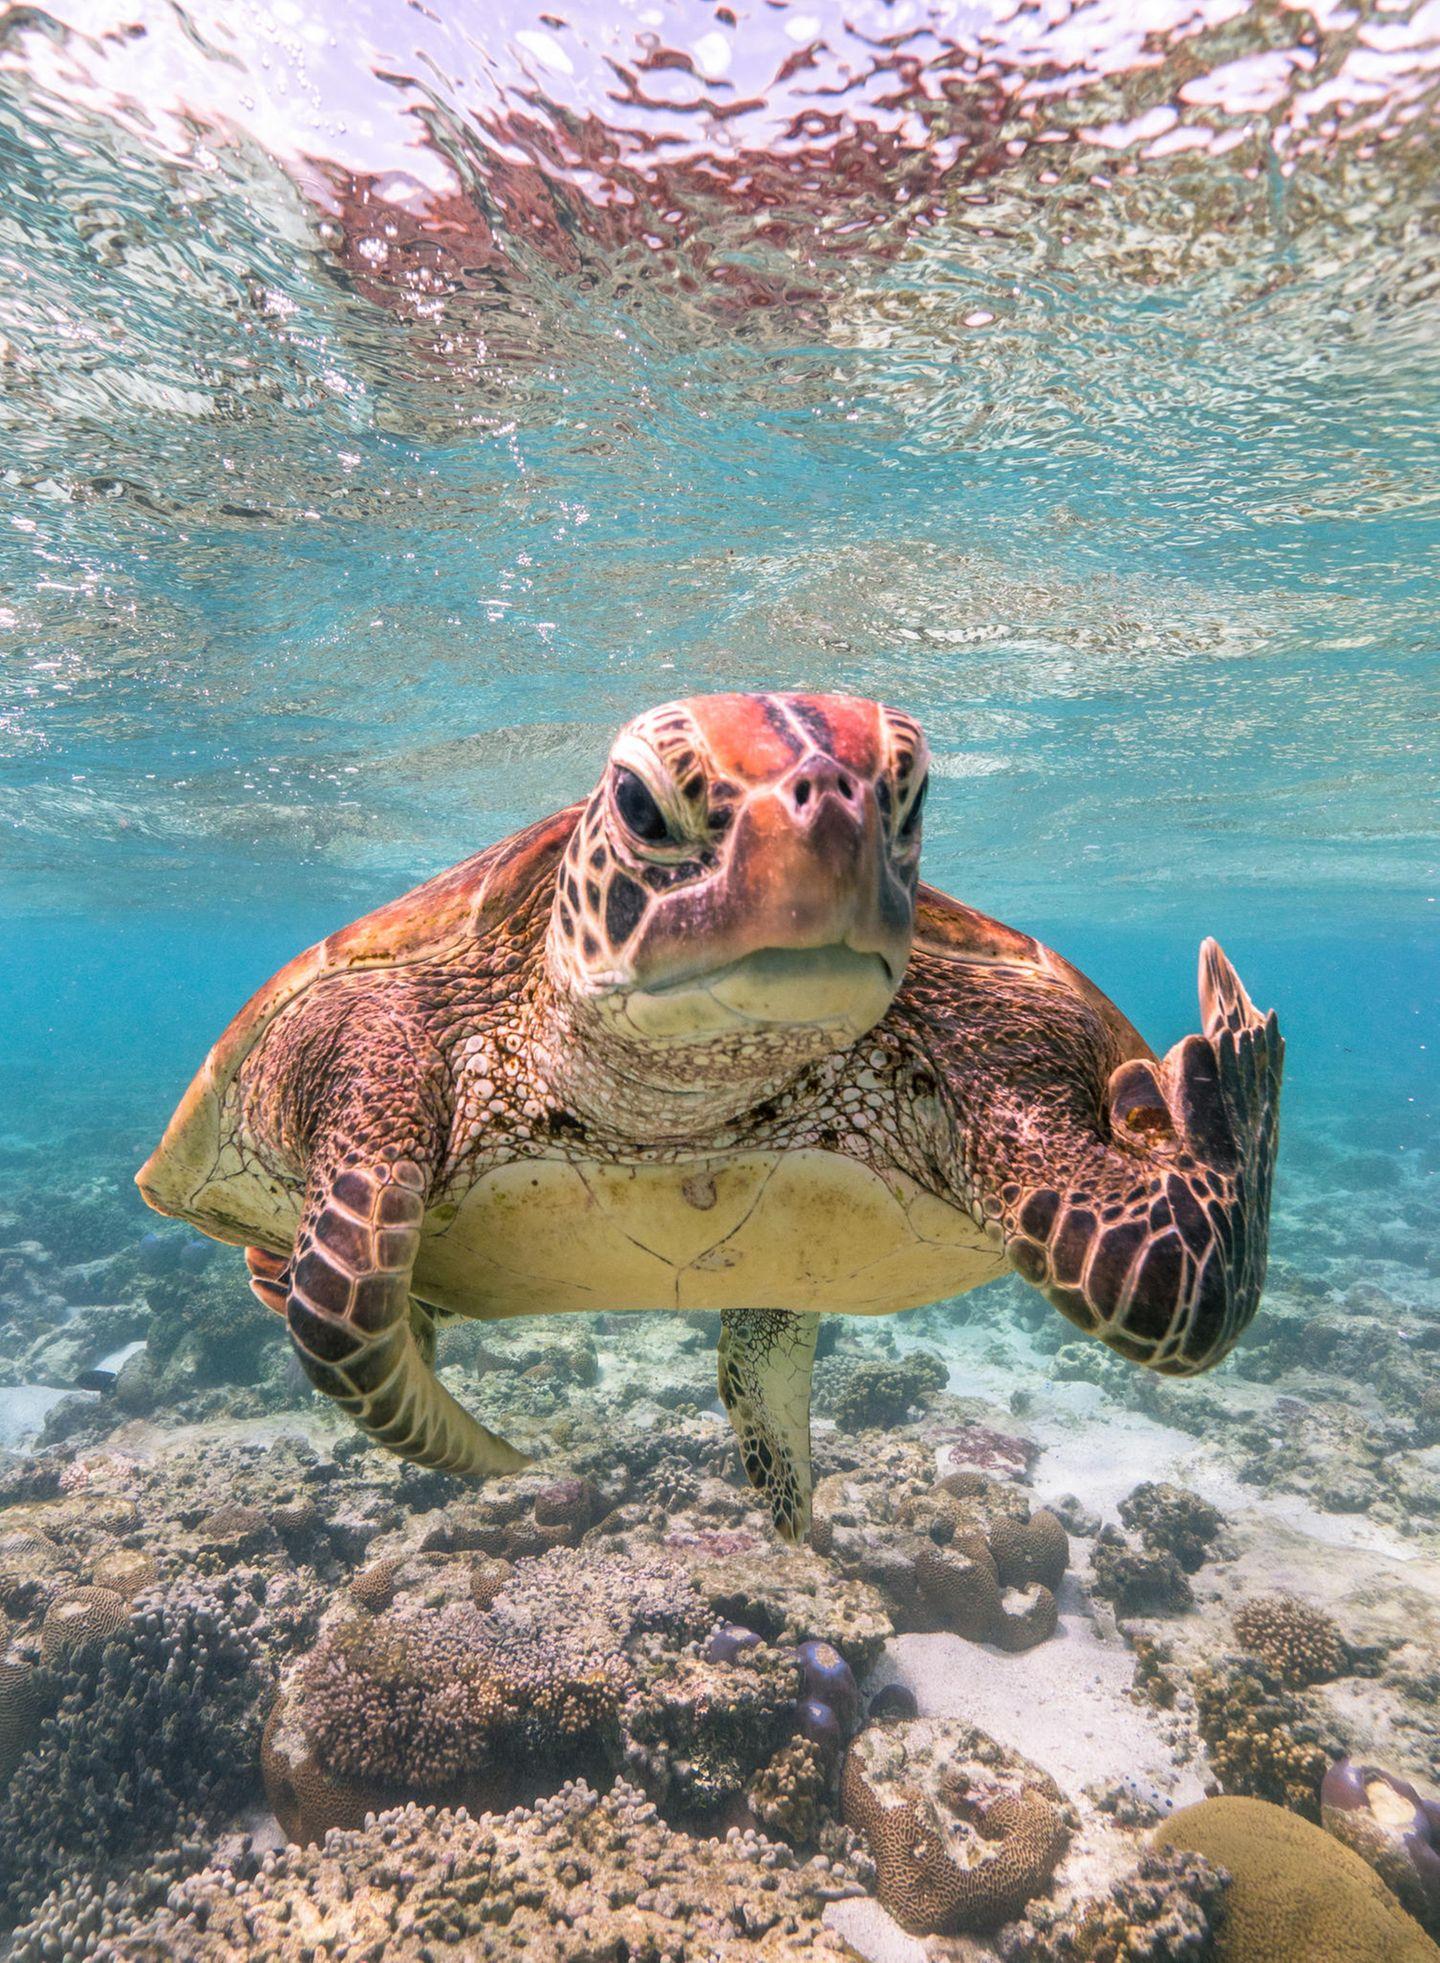 Comedy Wildlife Awards 2020: Schildkröte